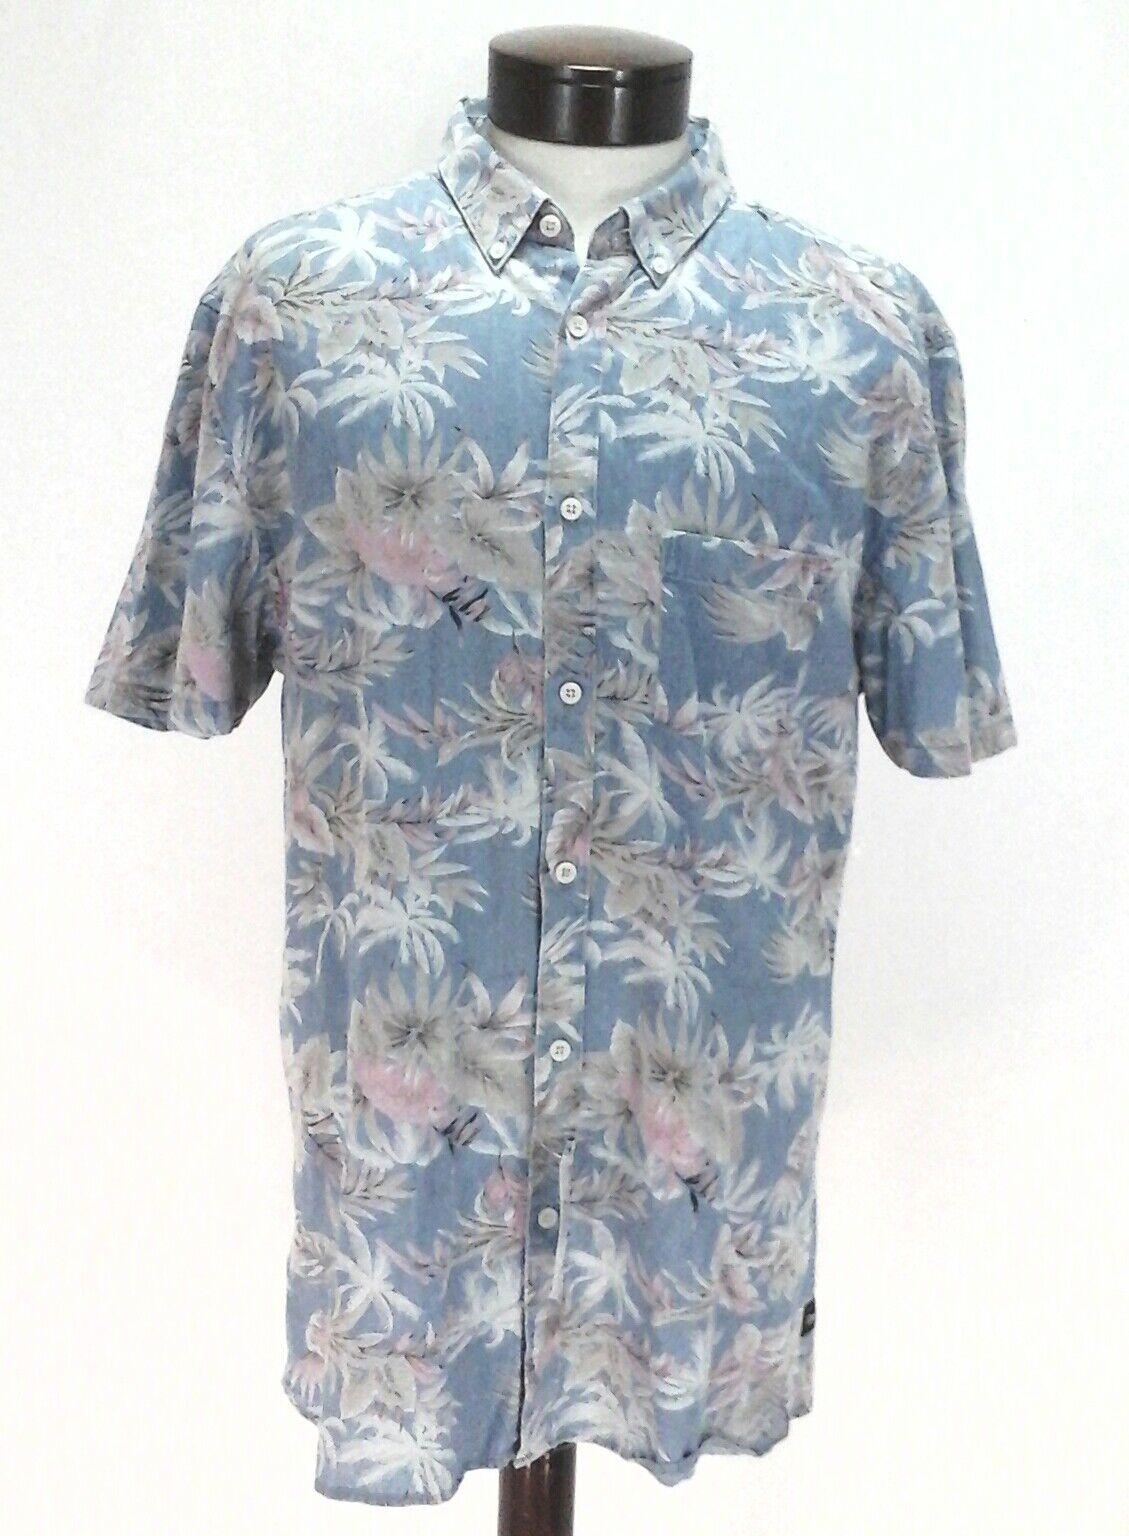 BARNEY COOLS Shirt HAWAIIAN Aloha bluee Pink Slim Fit Floral Mens XL fits M